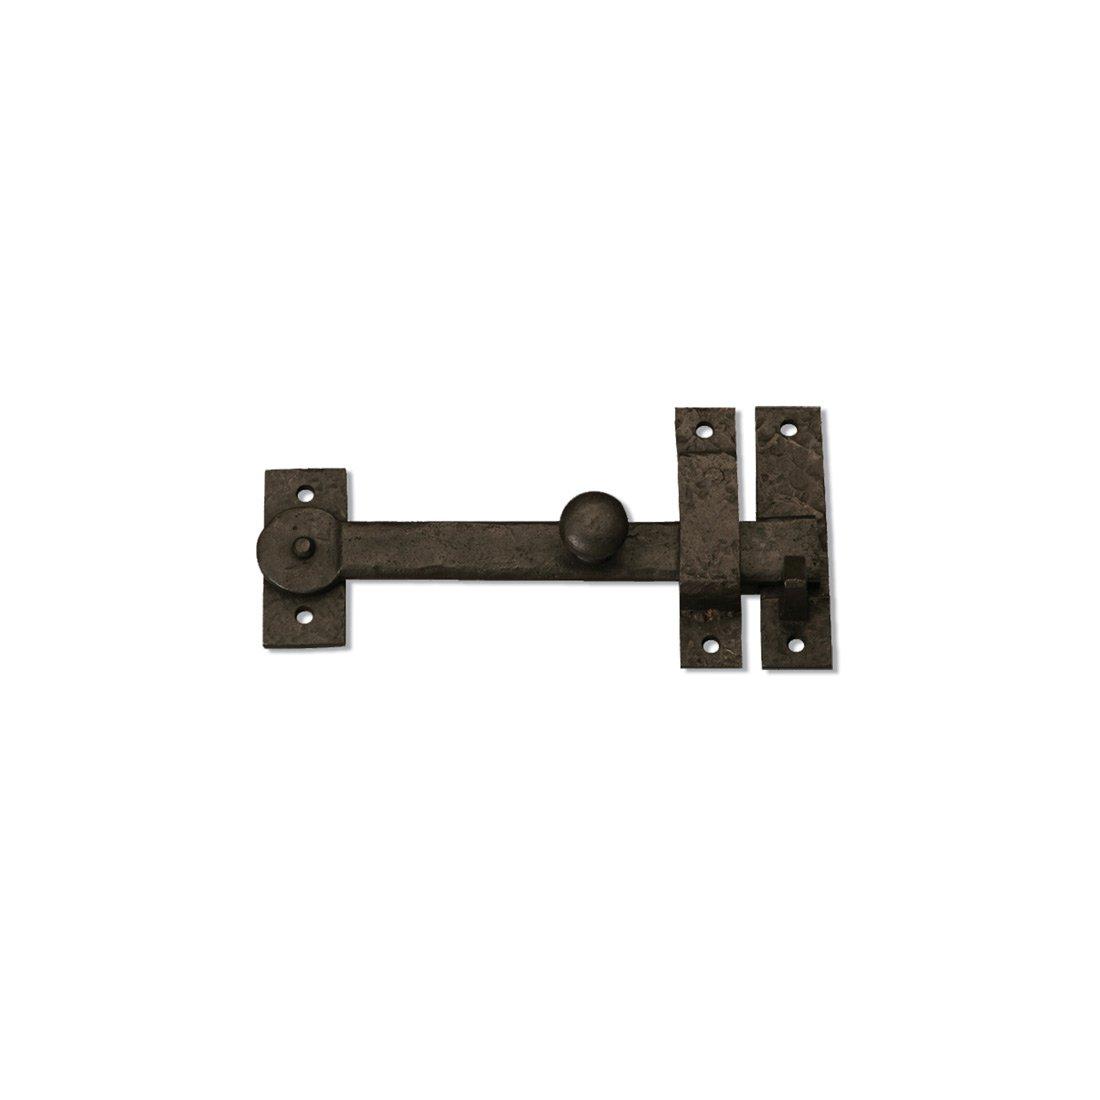 Coastal Bronze - 7.5'' Gate Drop Bar w/ Knob (Lever Latch) - Solid Bronze